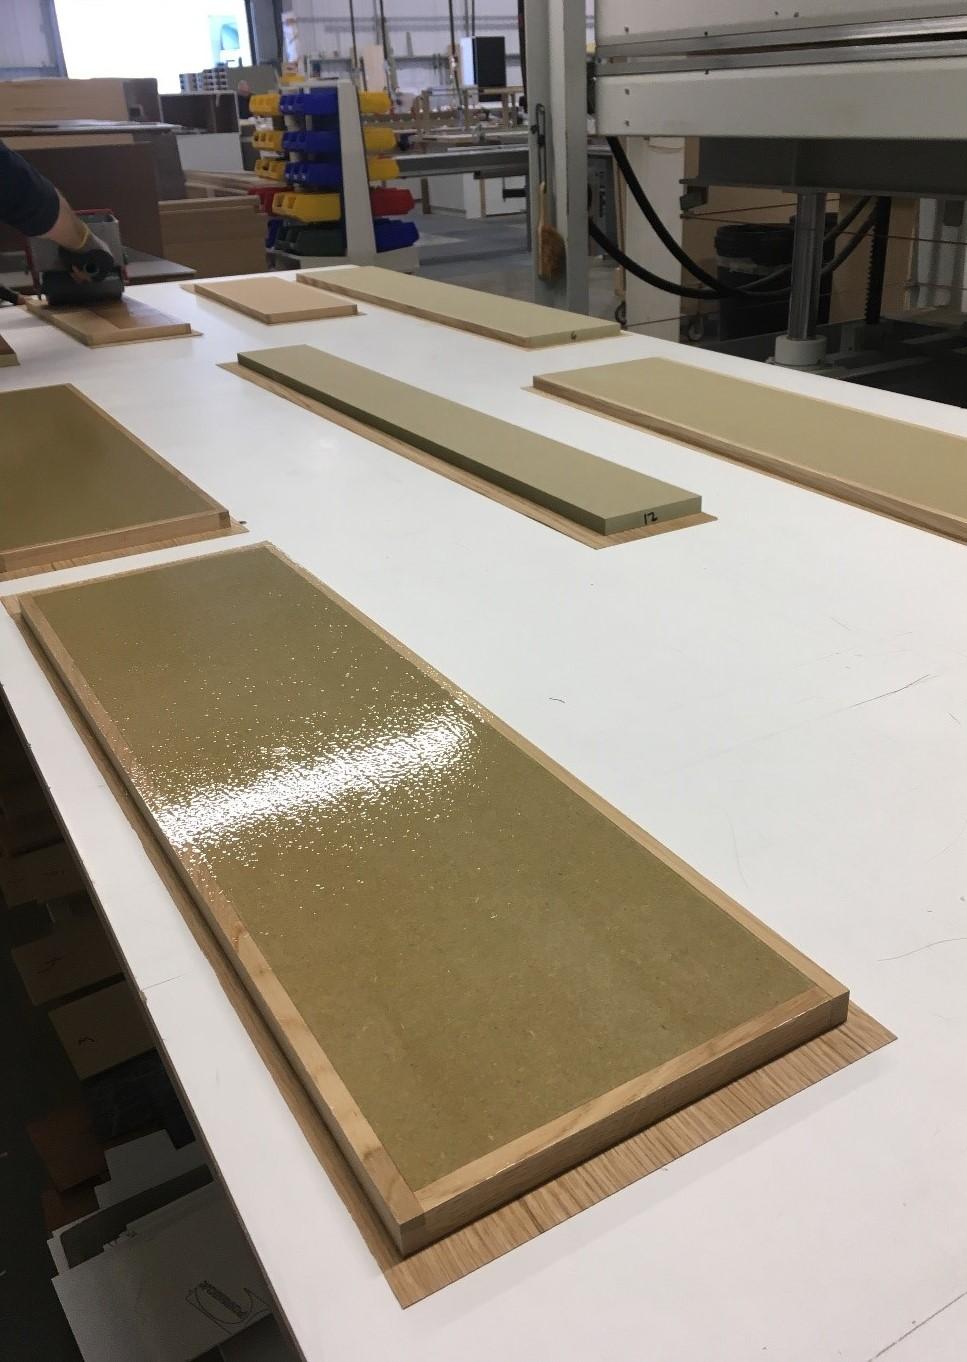 Panels in the early veneer process